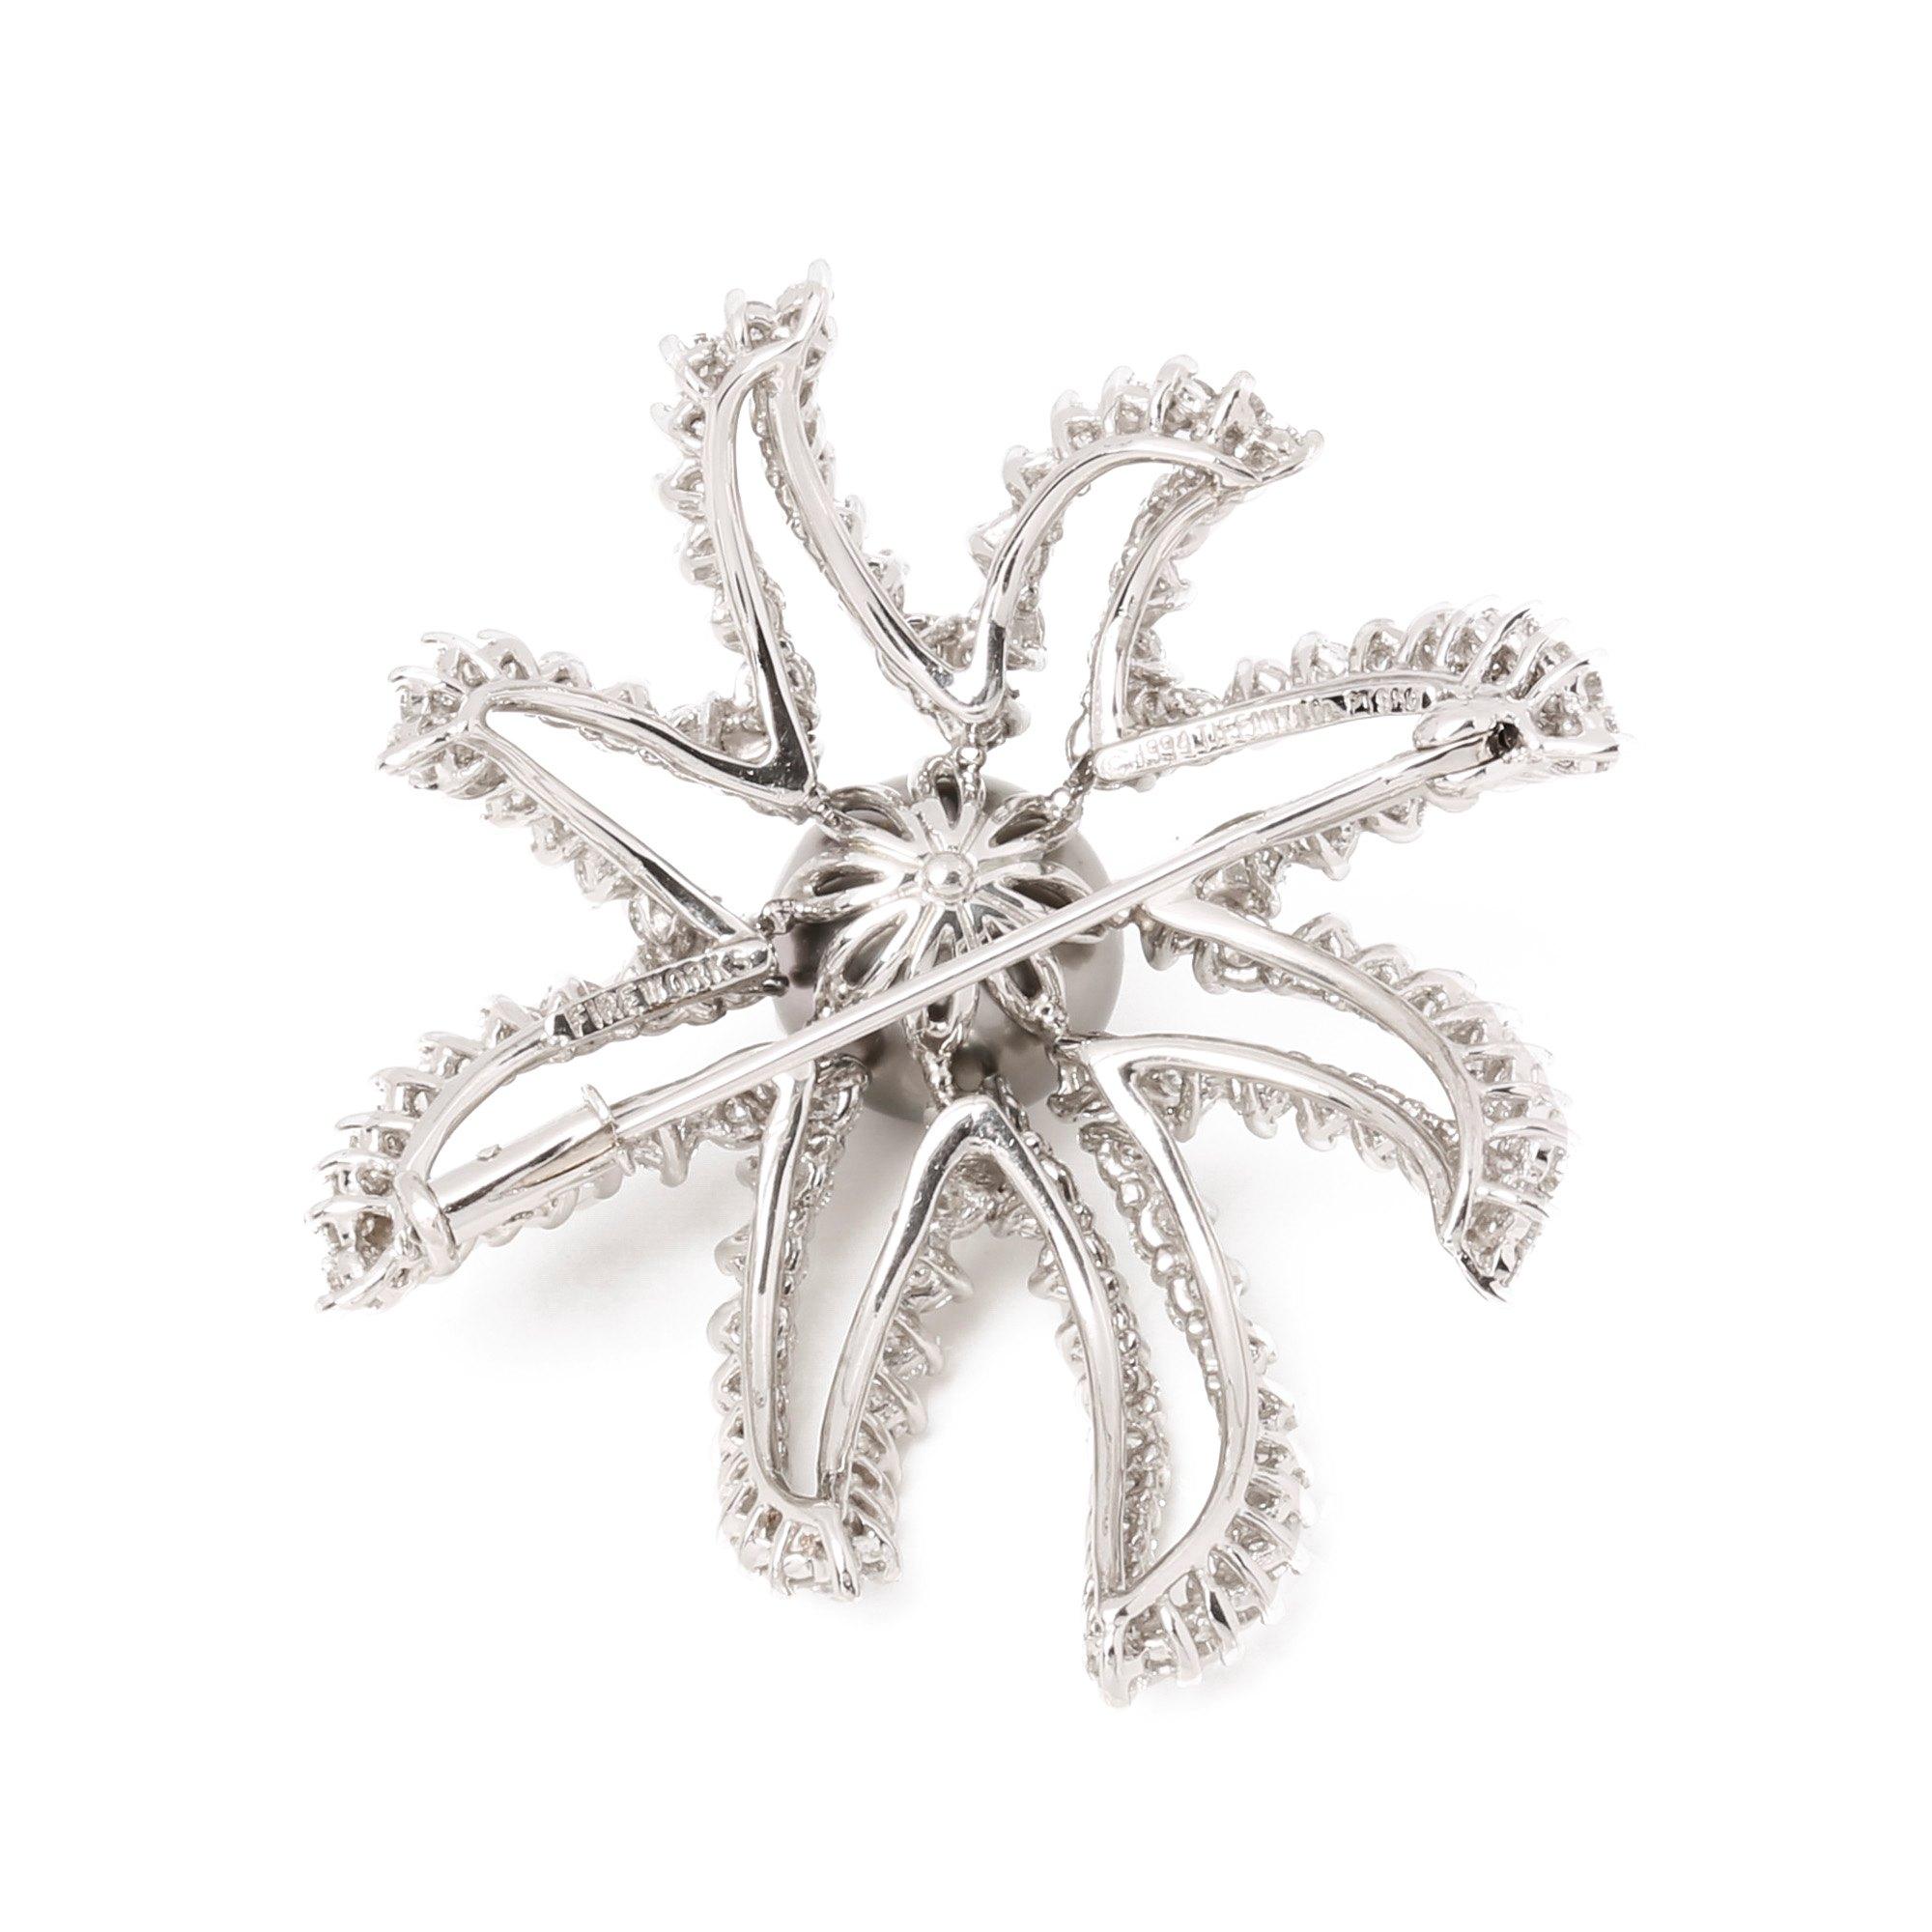 Tiffany & Co. Pearl & Diamond Fireworks Brooch